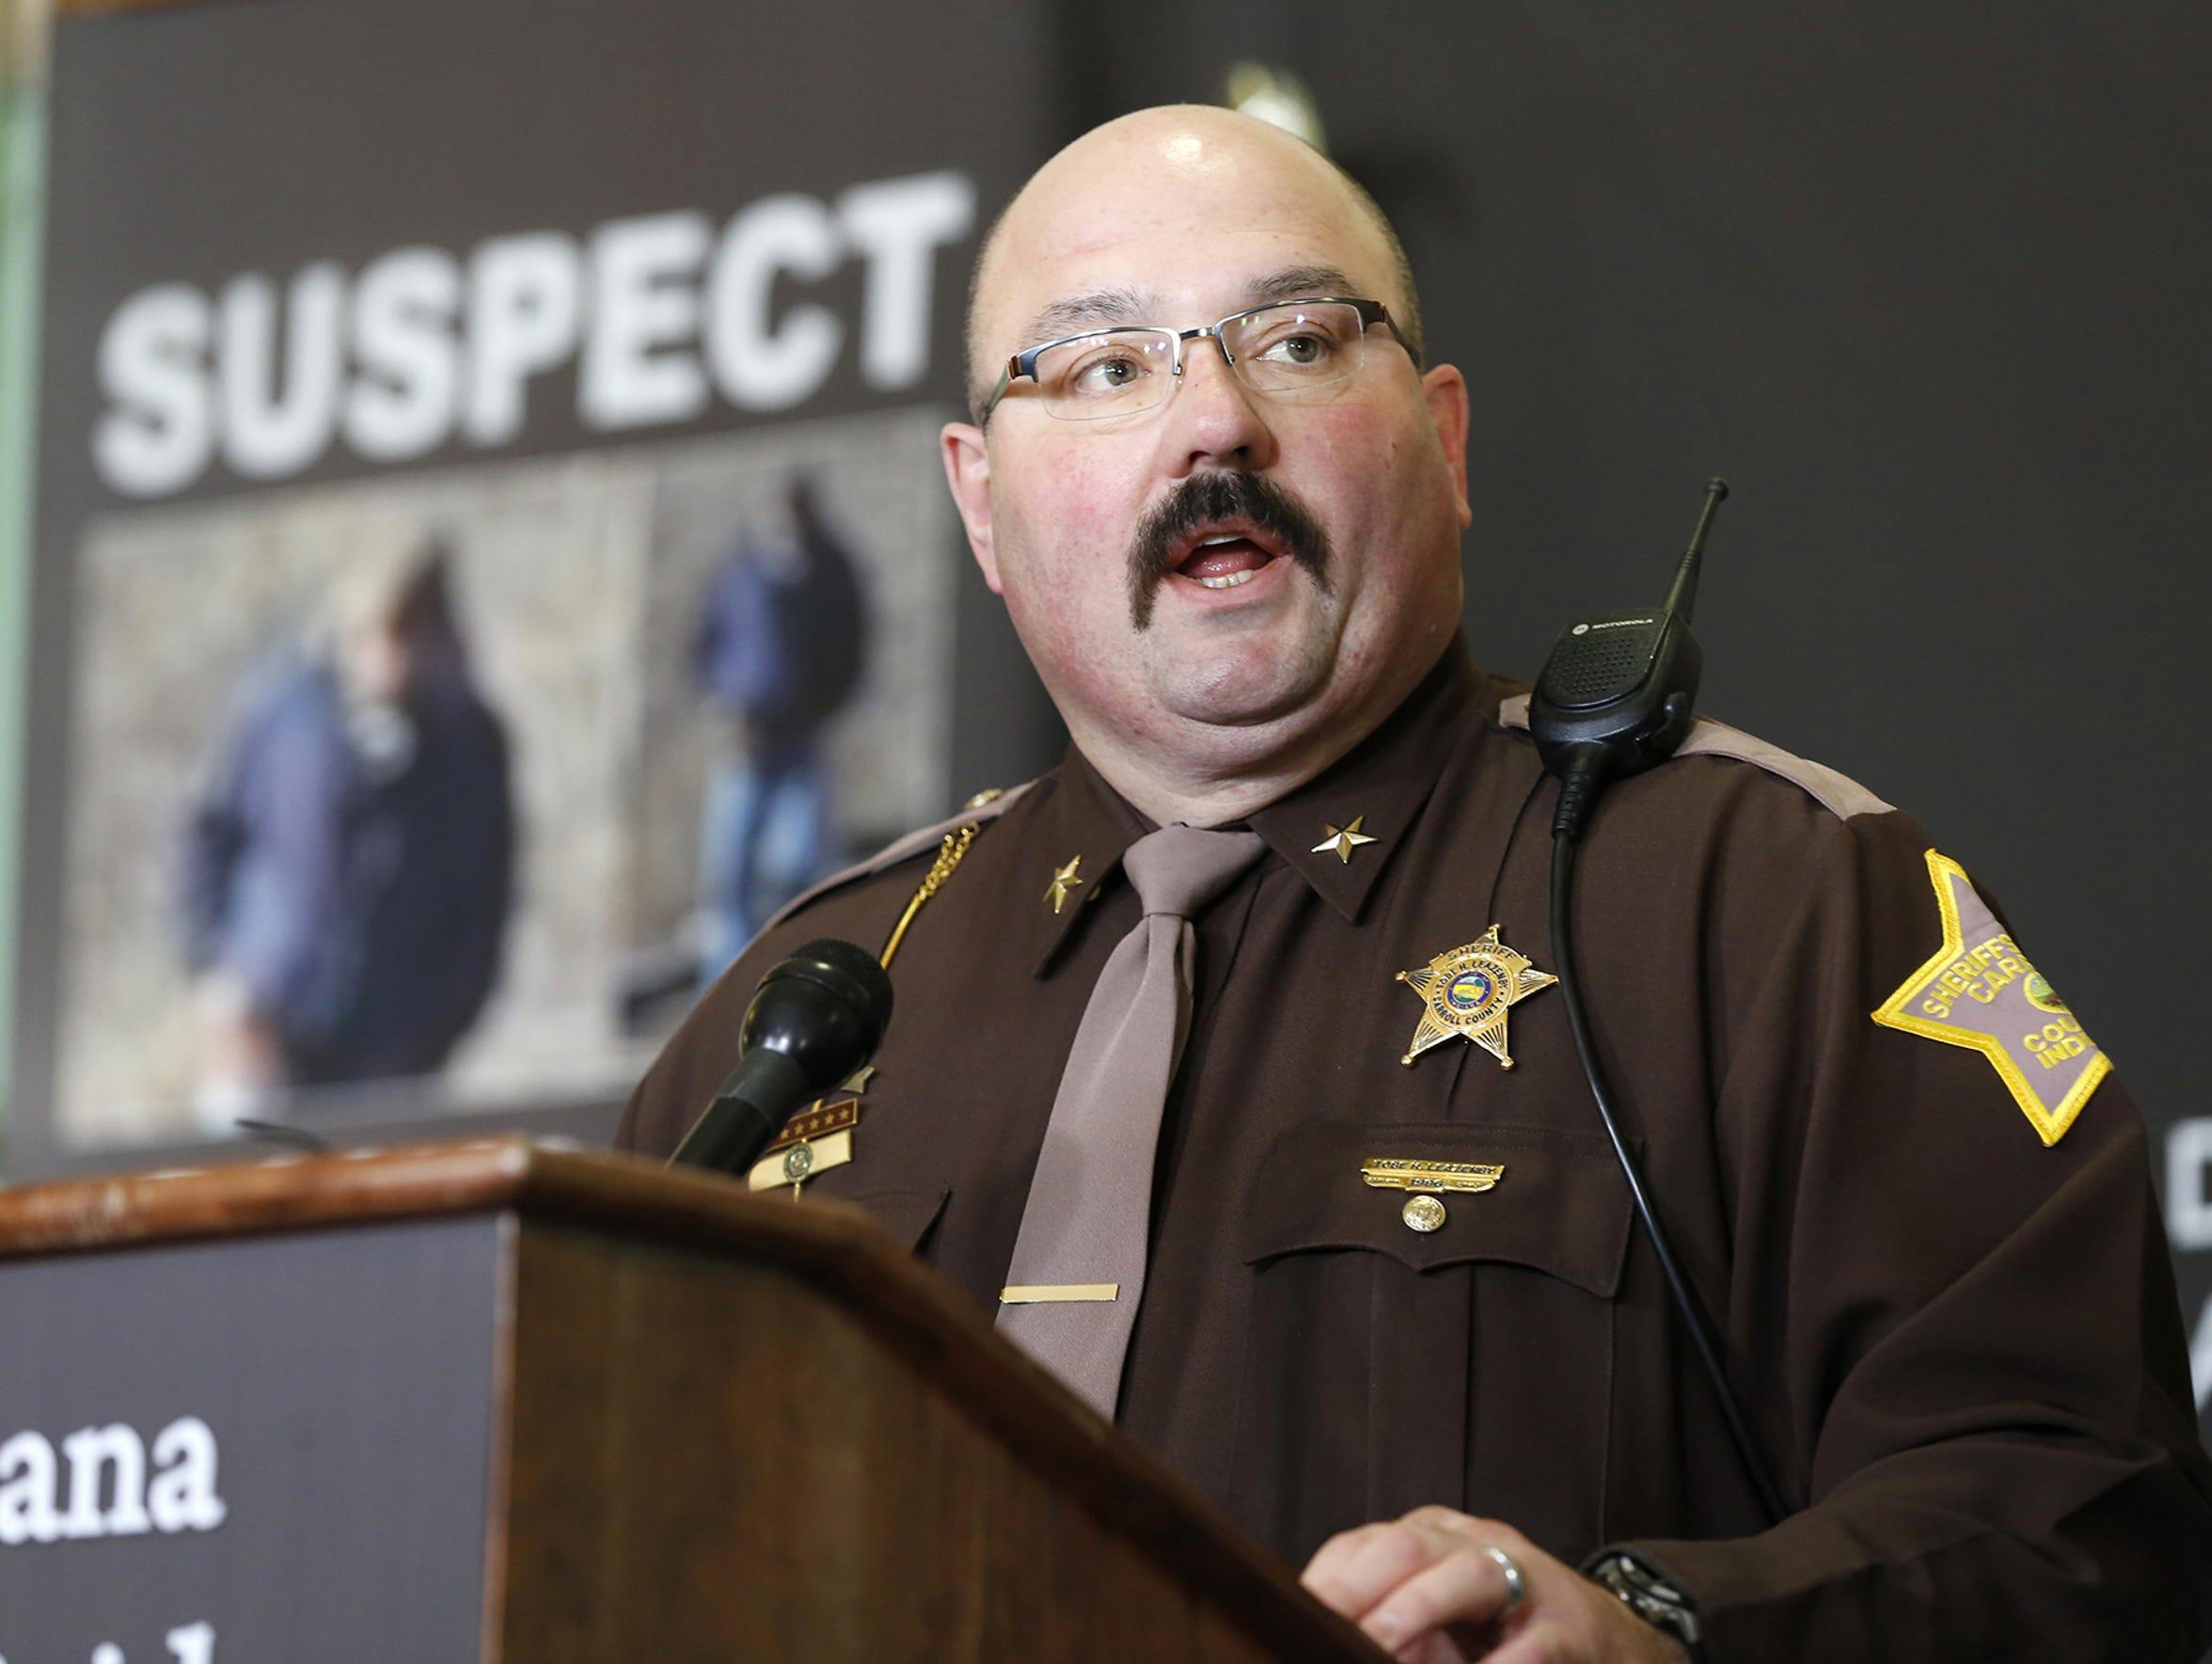 Carroll County Sheriff Tobe Leazenby speaks during